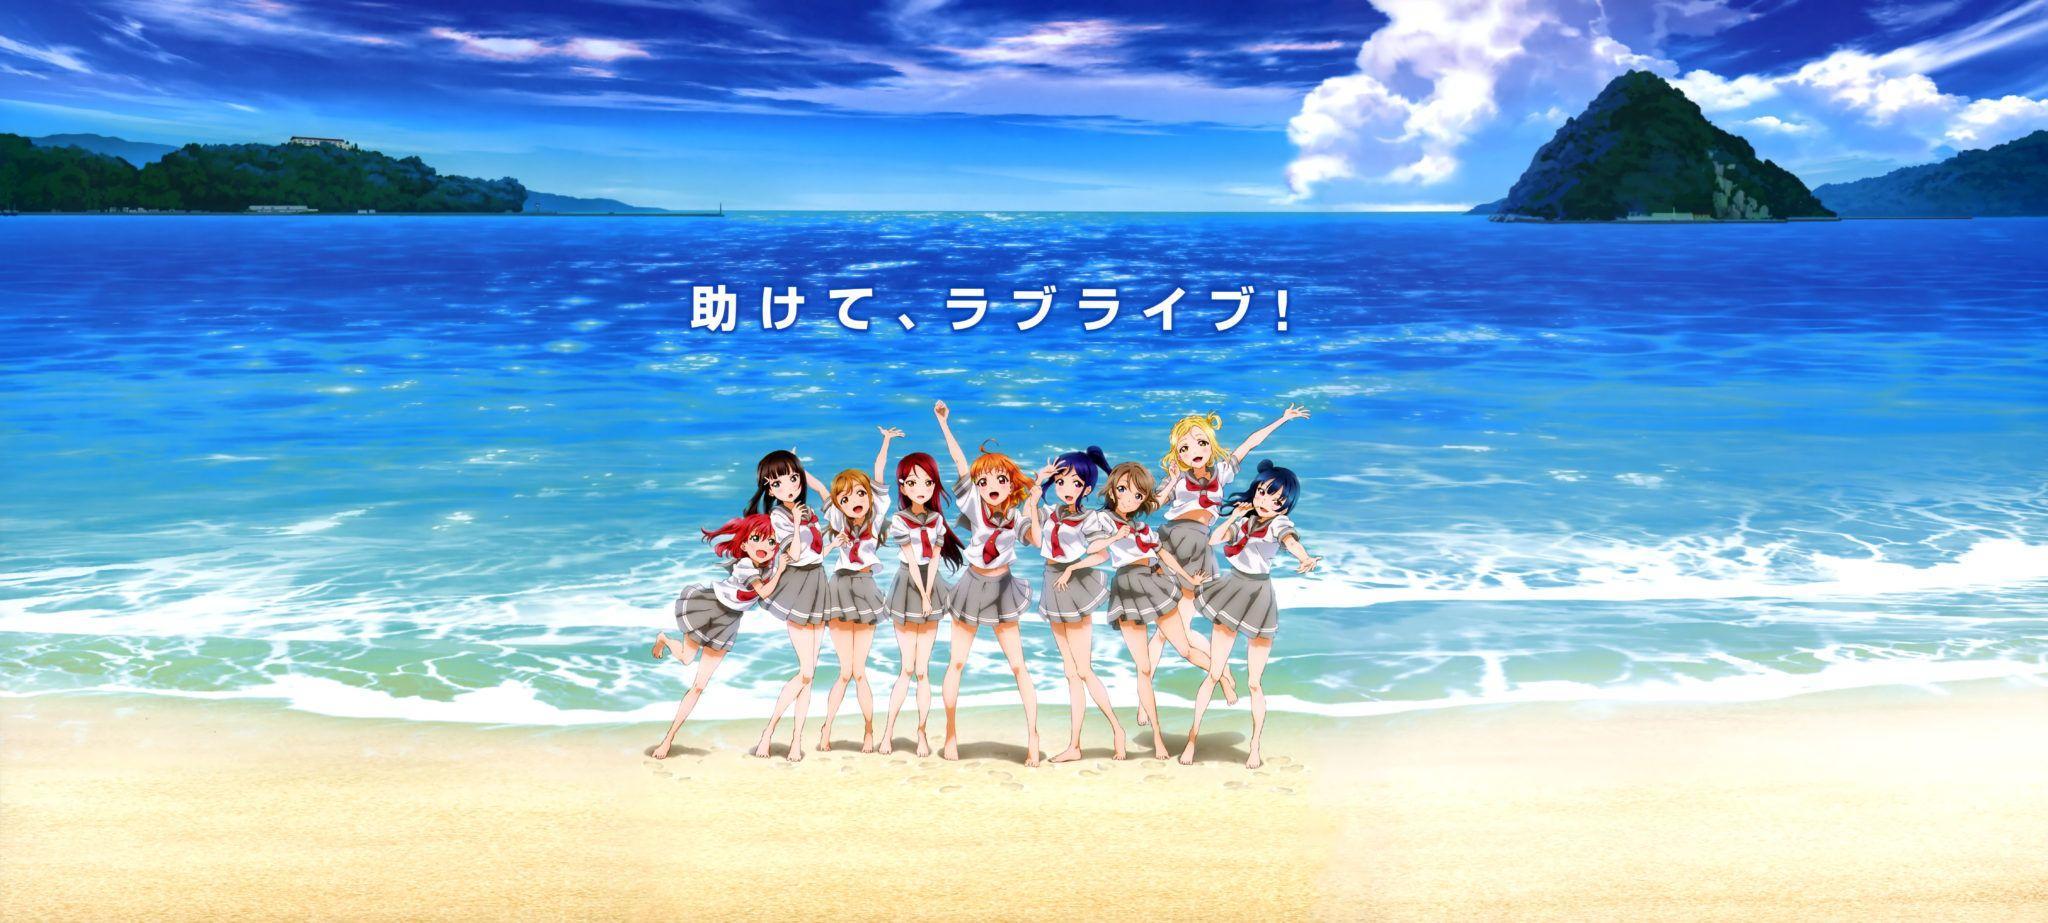 love live sunshine anime key